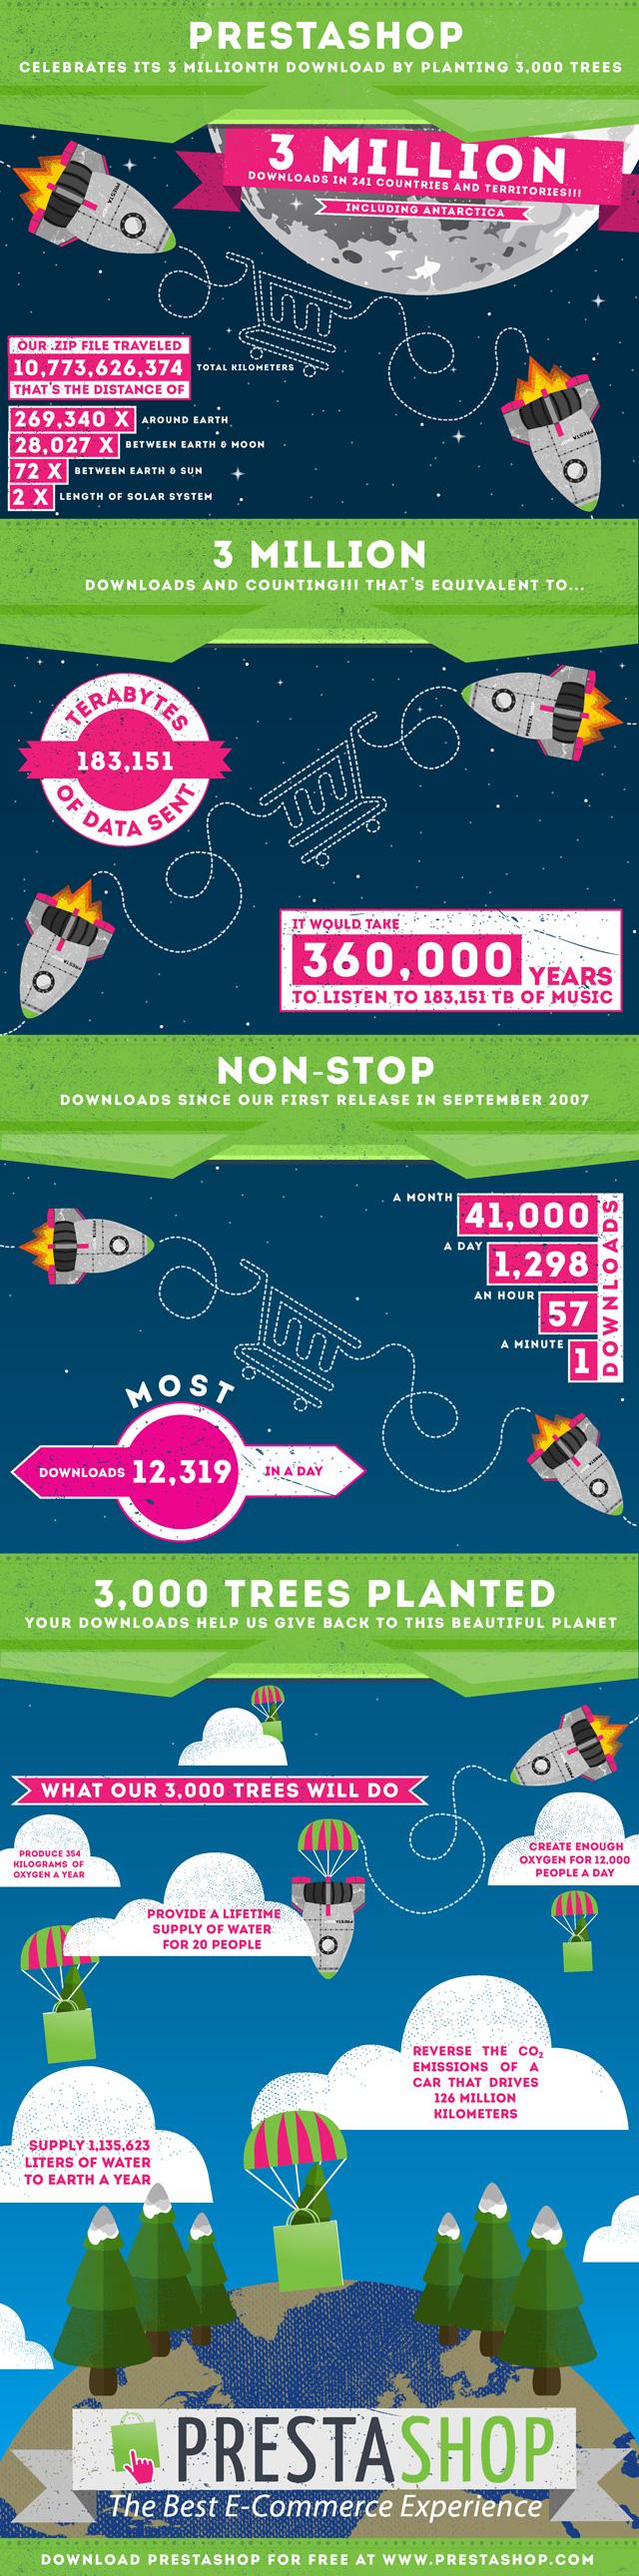 Infografica Prestashop - Traguardi e tremila alberi piantati